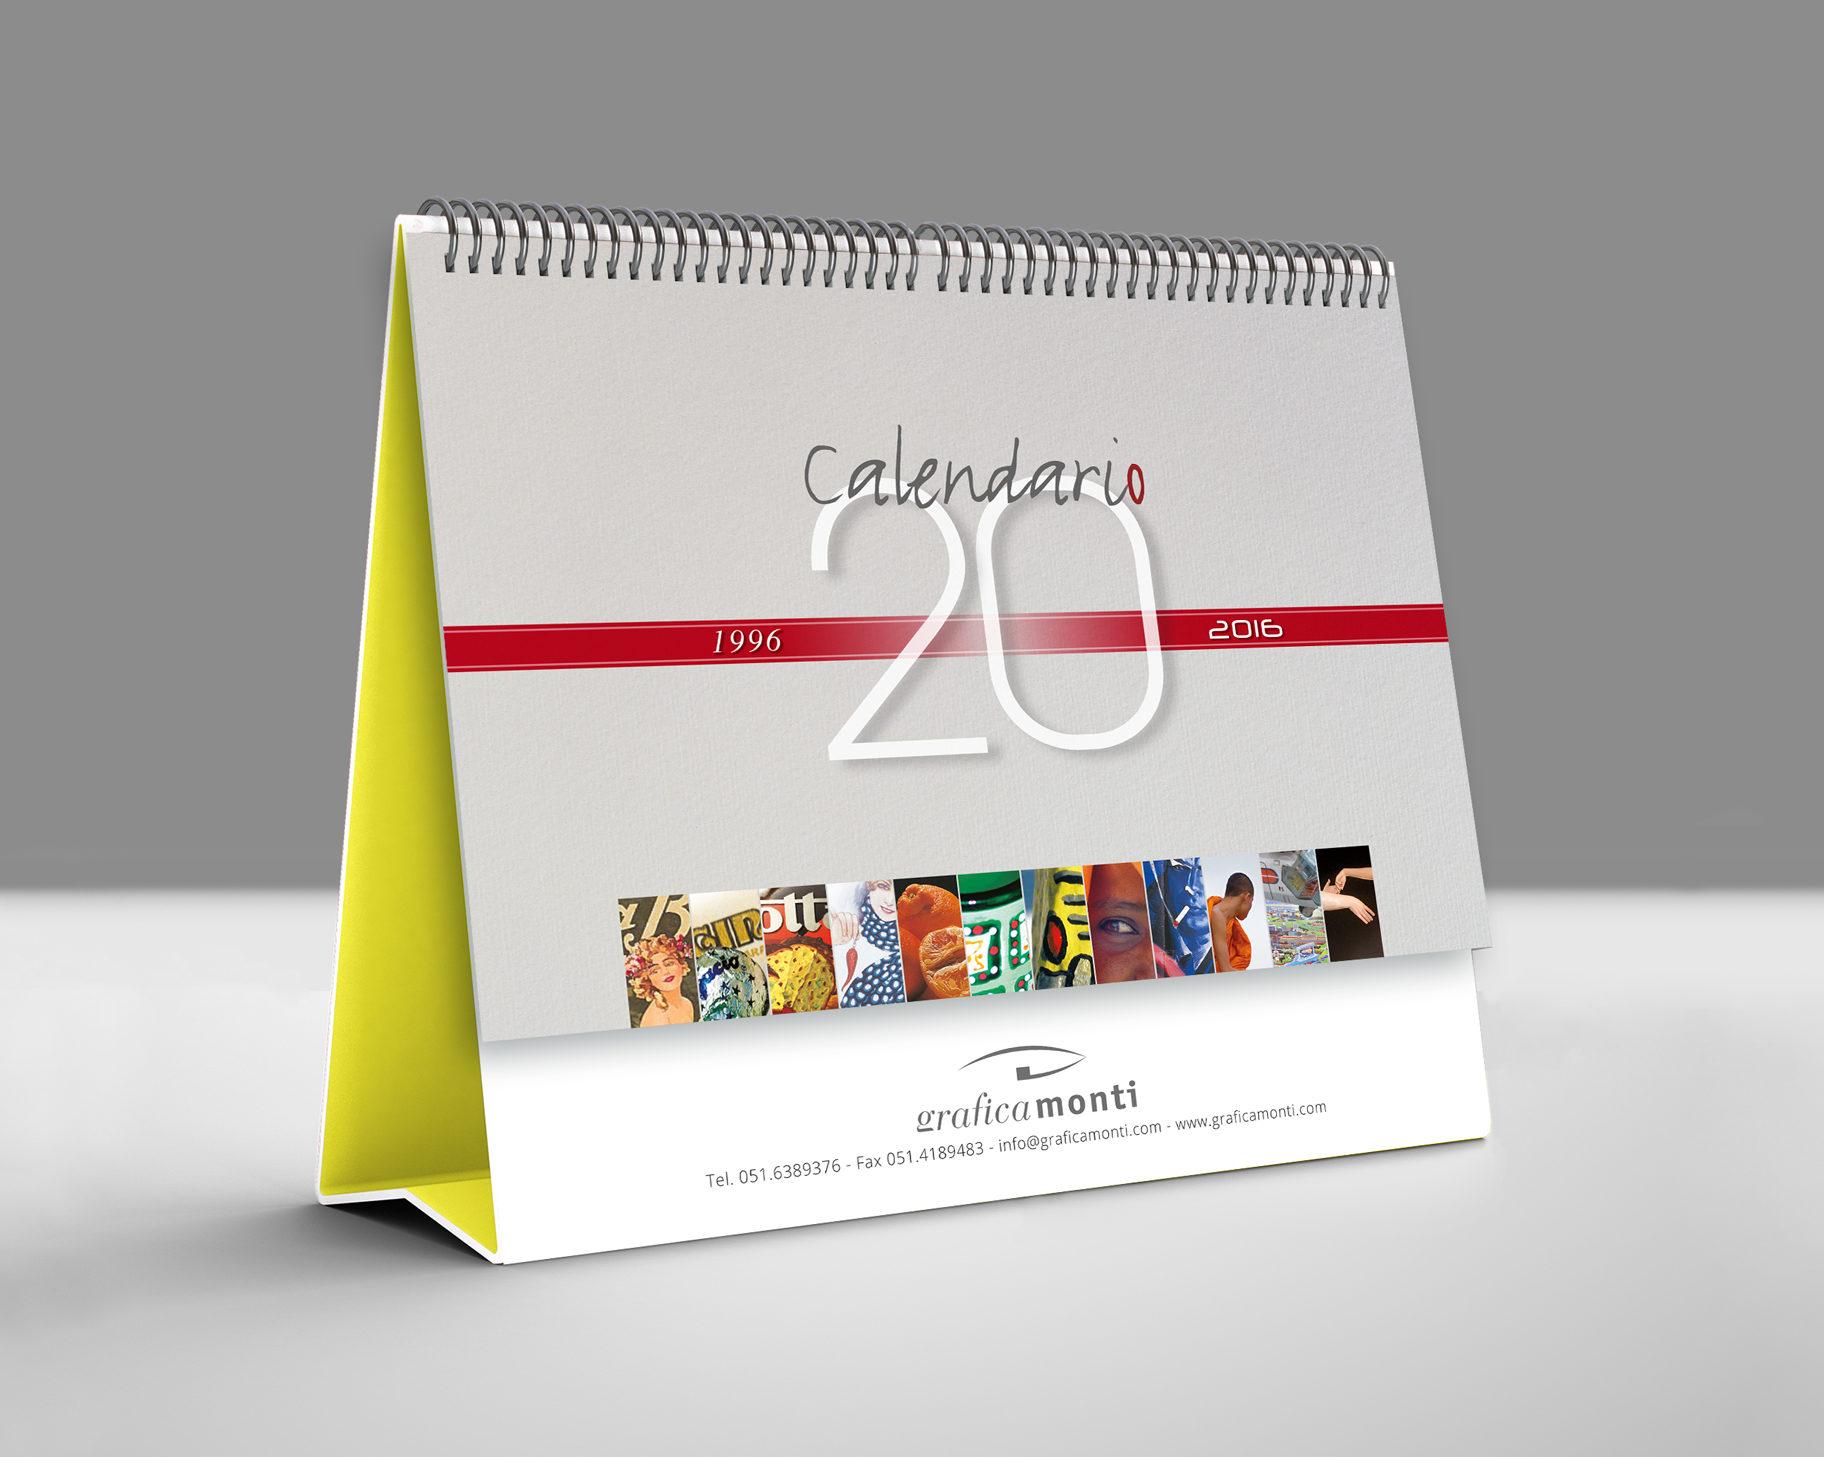 GraficaMonti-Calendario-2016